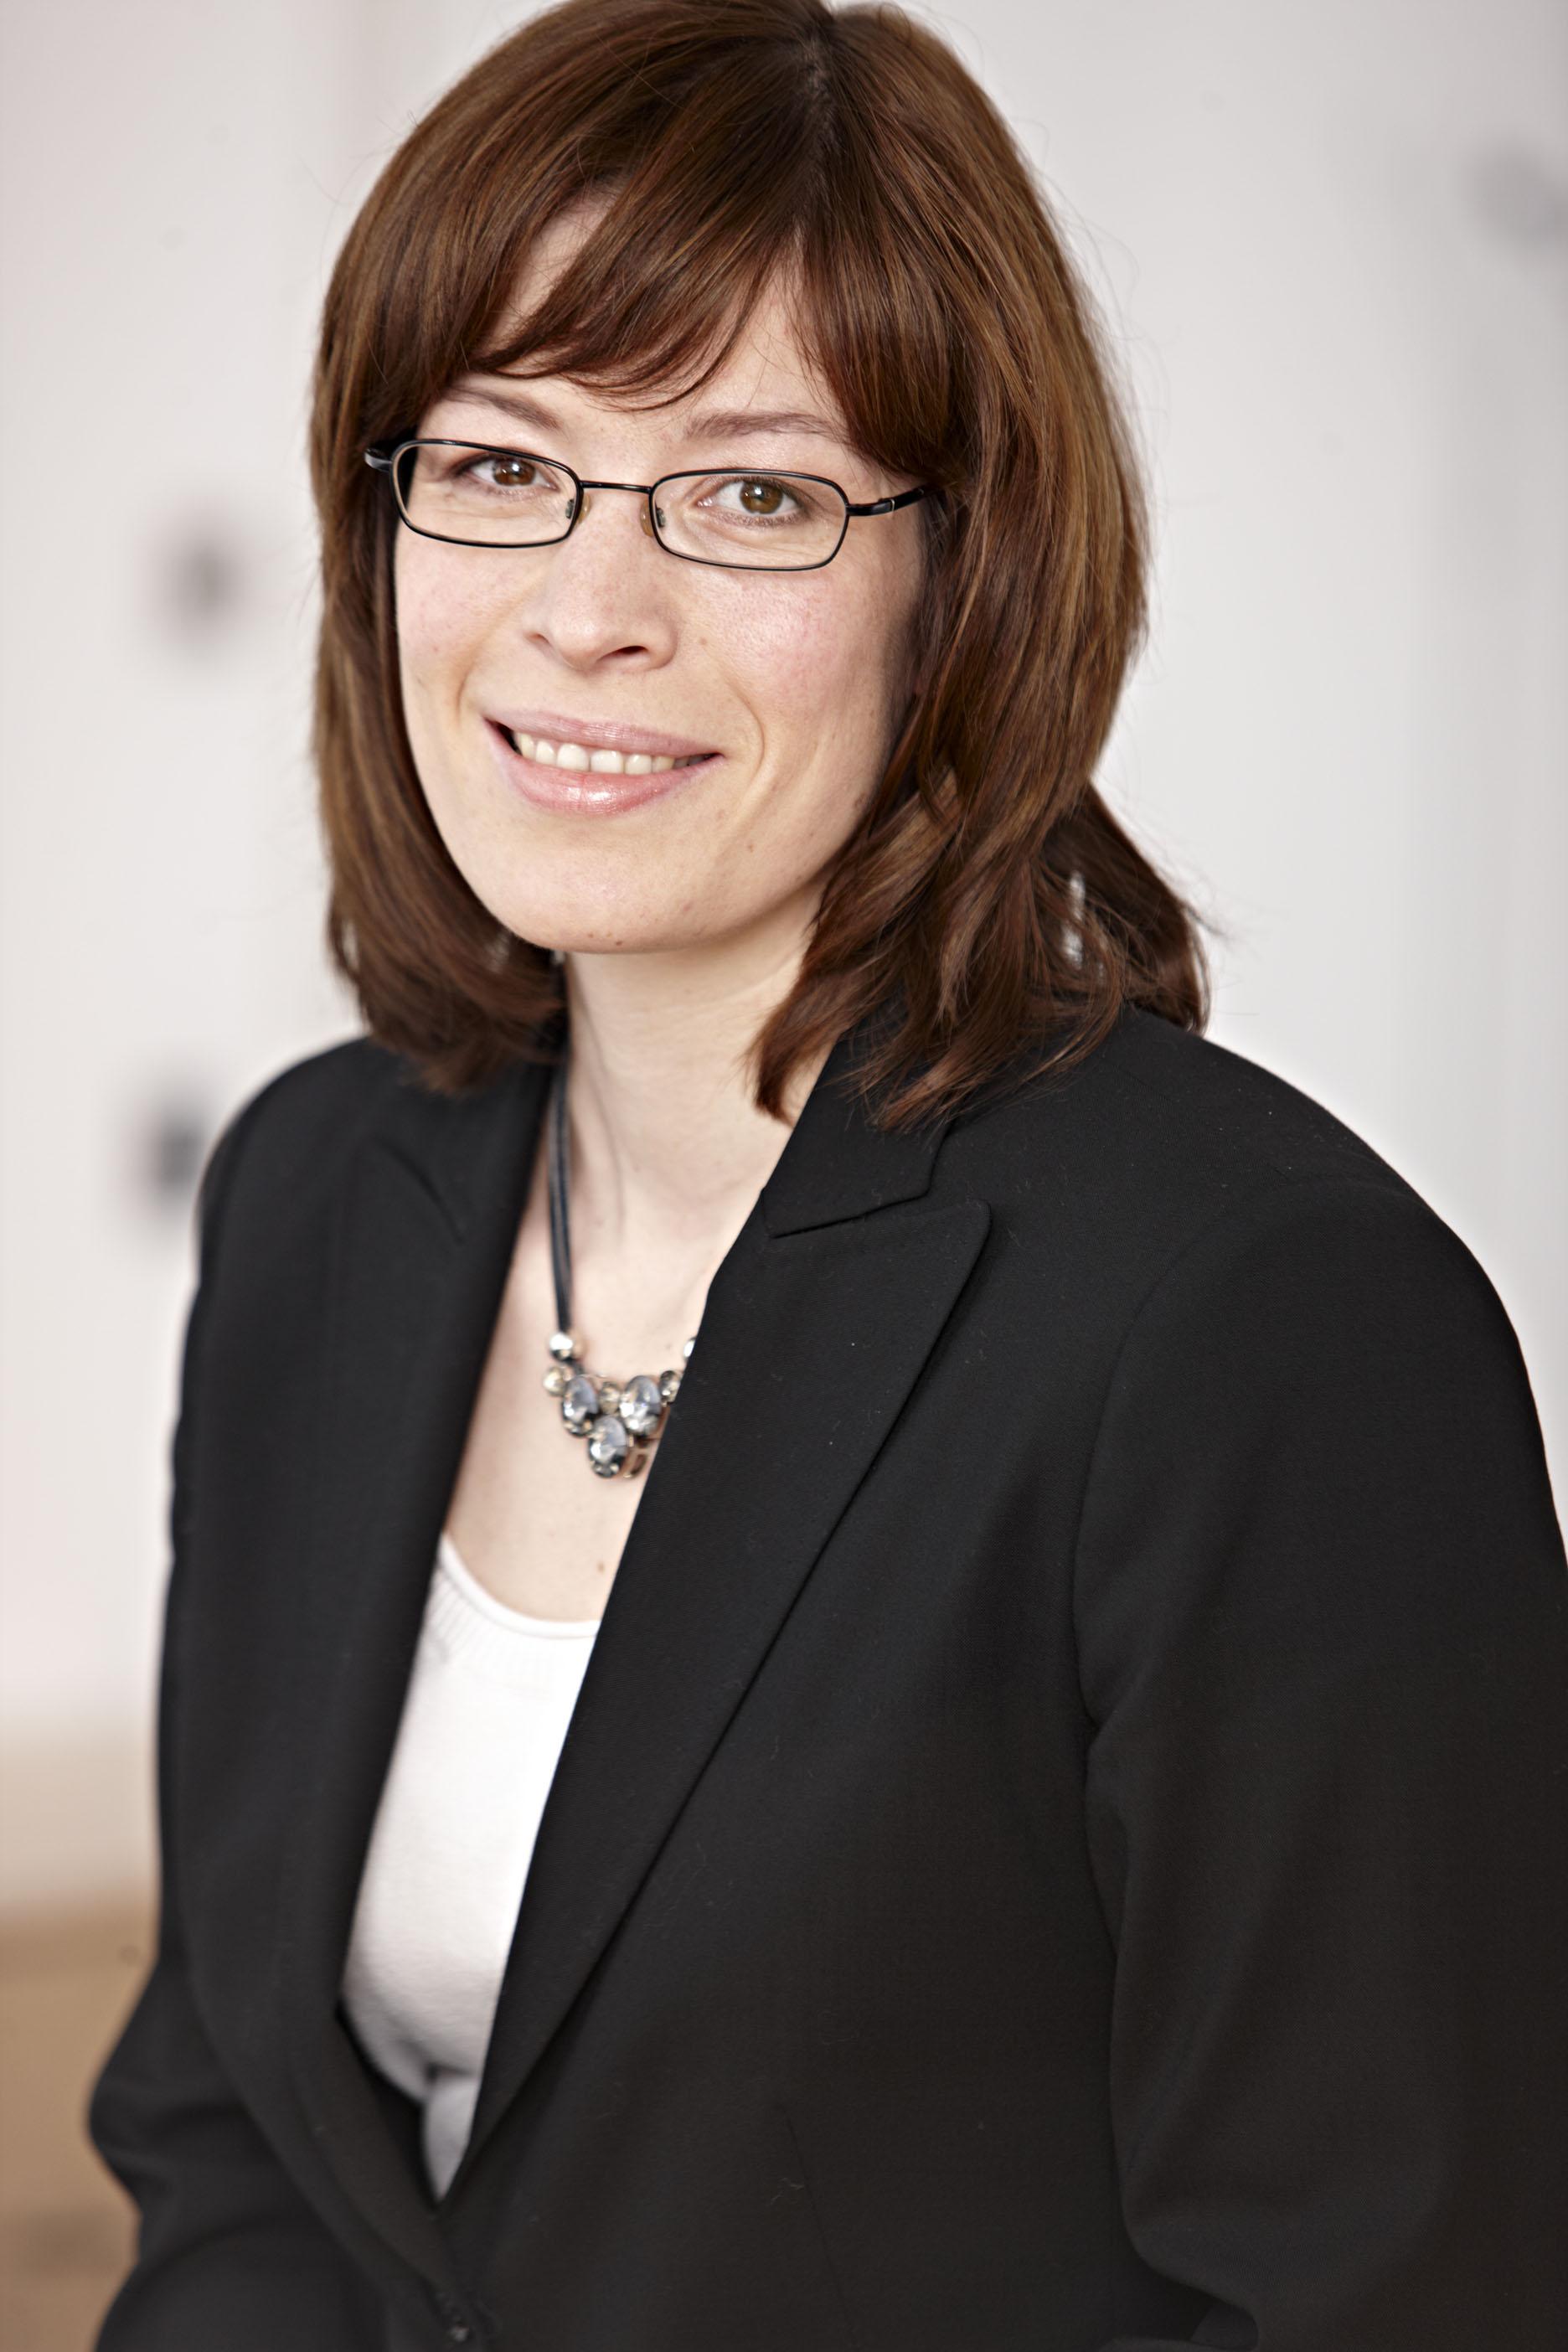 Portrait of Nicole Beiersdorf